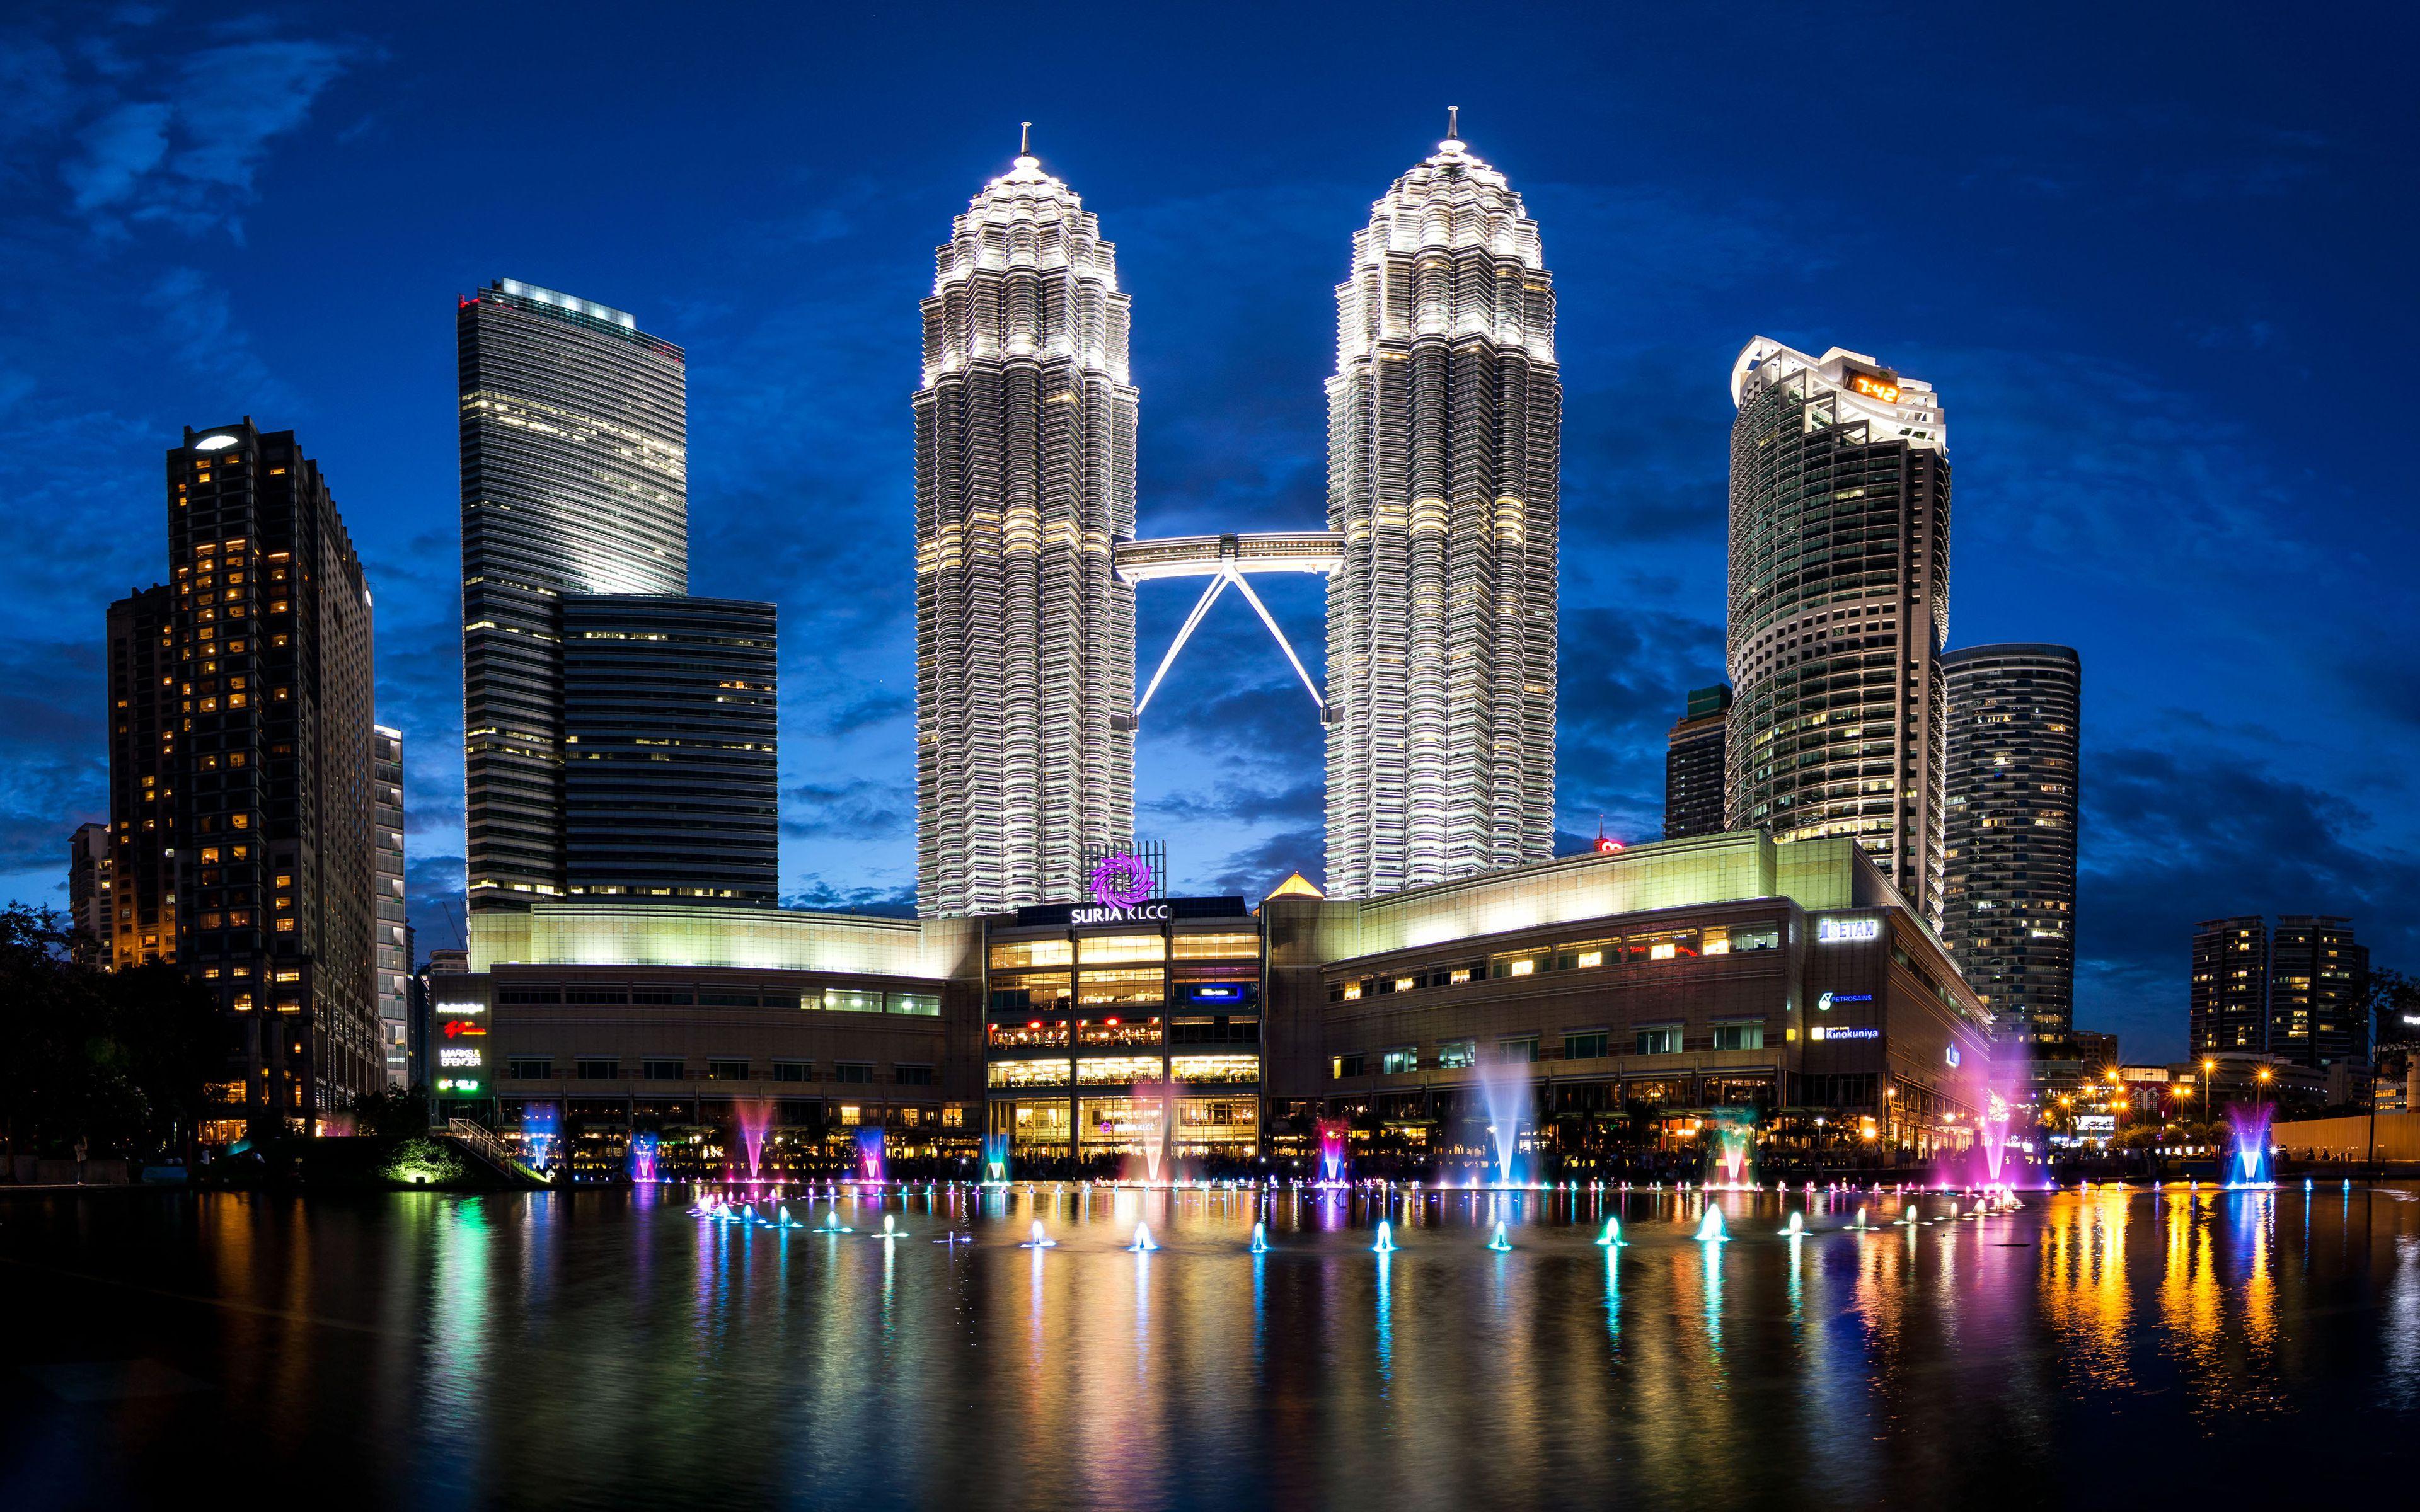 Petronas towers malaysia skyline 4k wallpaper for Wallpaper home malaysia